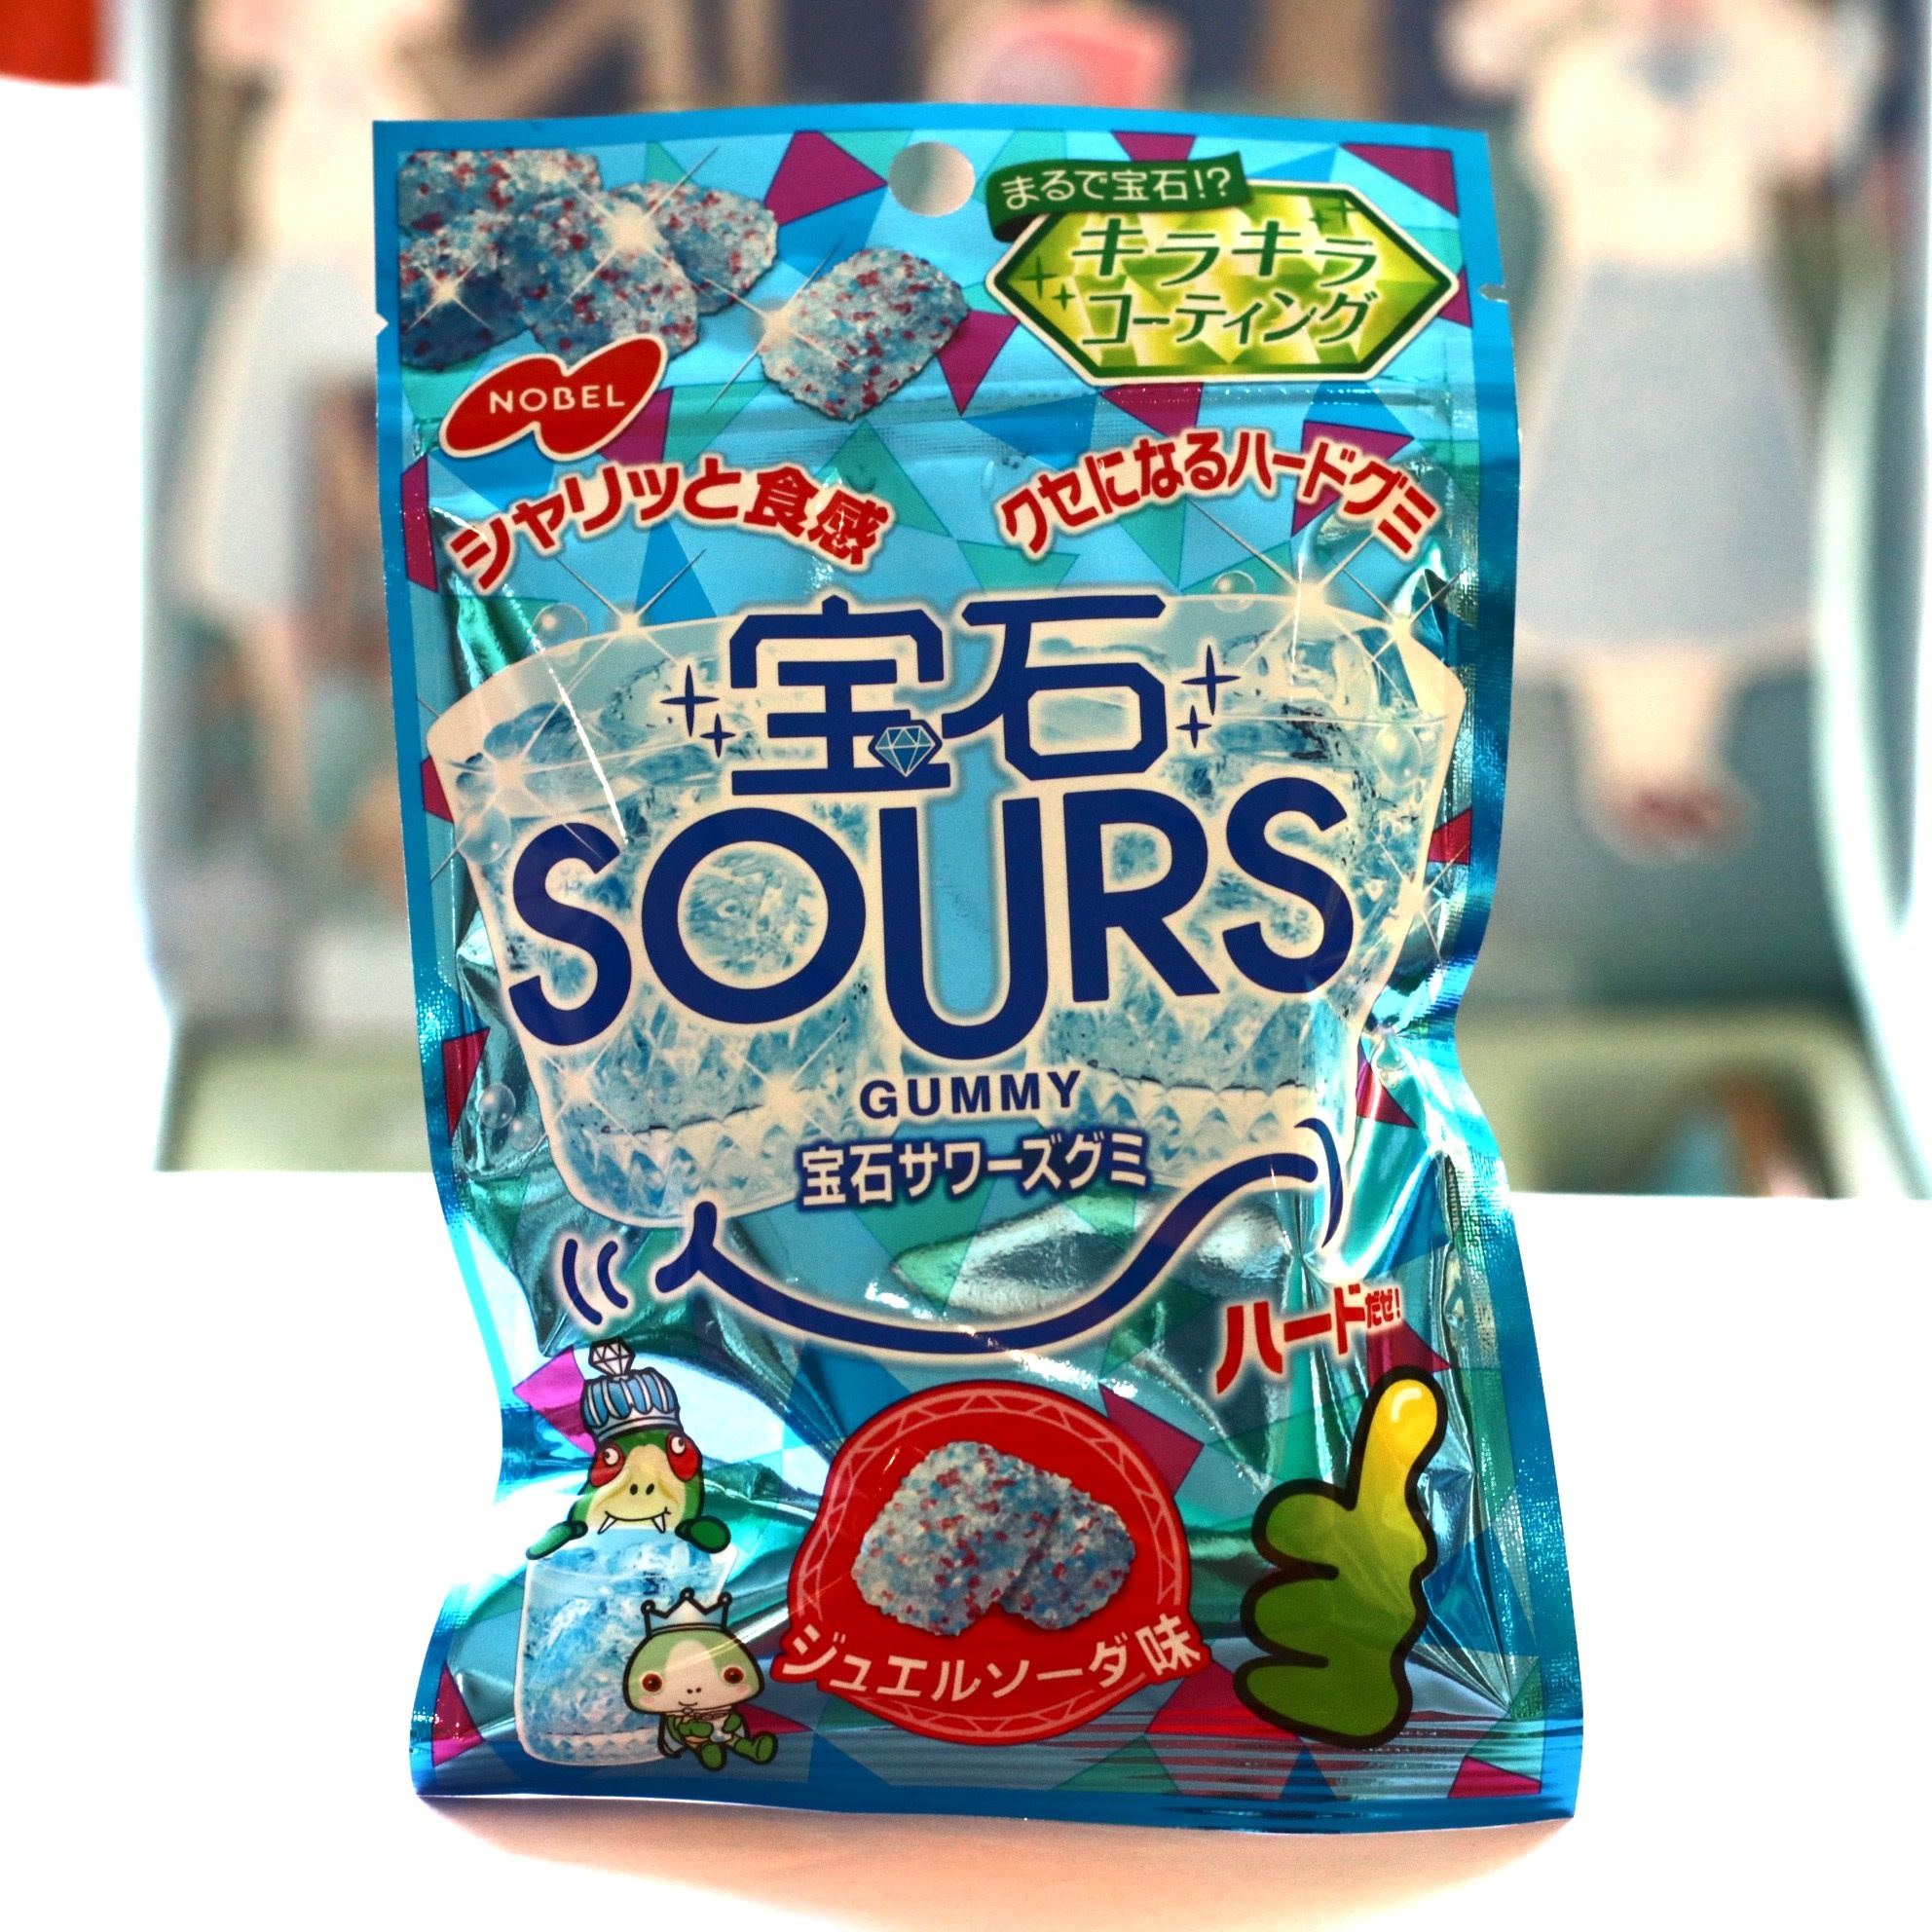 Nobel Nobel Jewels Soda Gummy